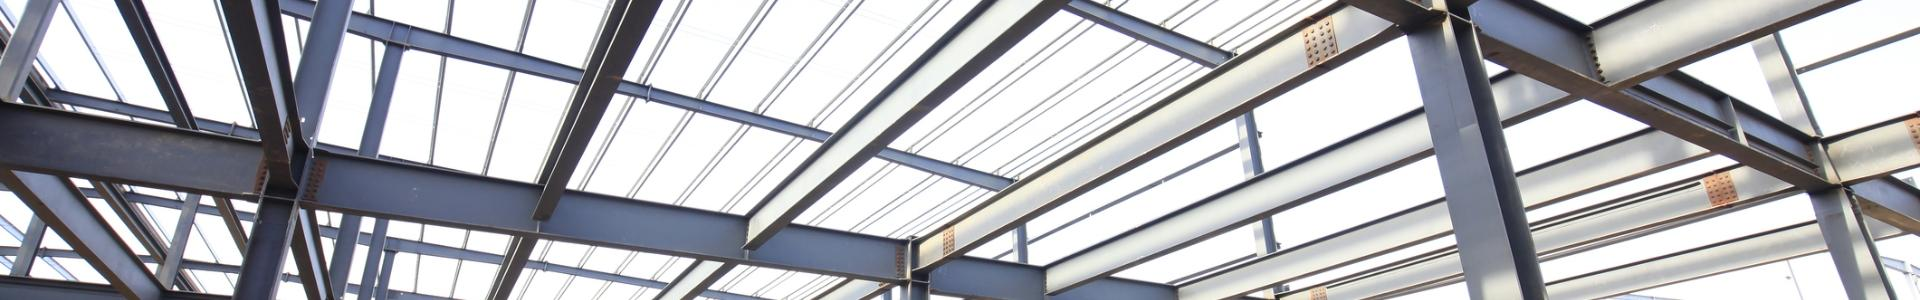 Banner stalowa konstrukcja dachowa